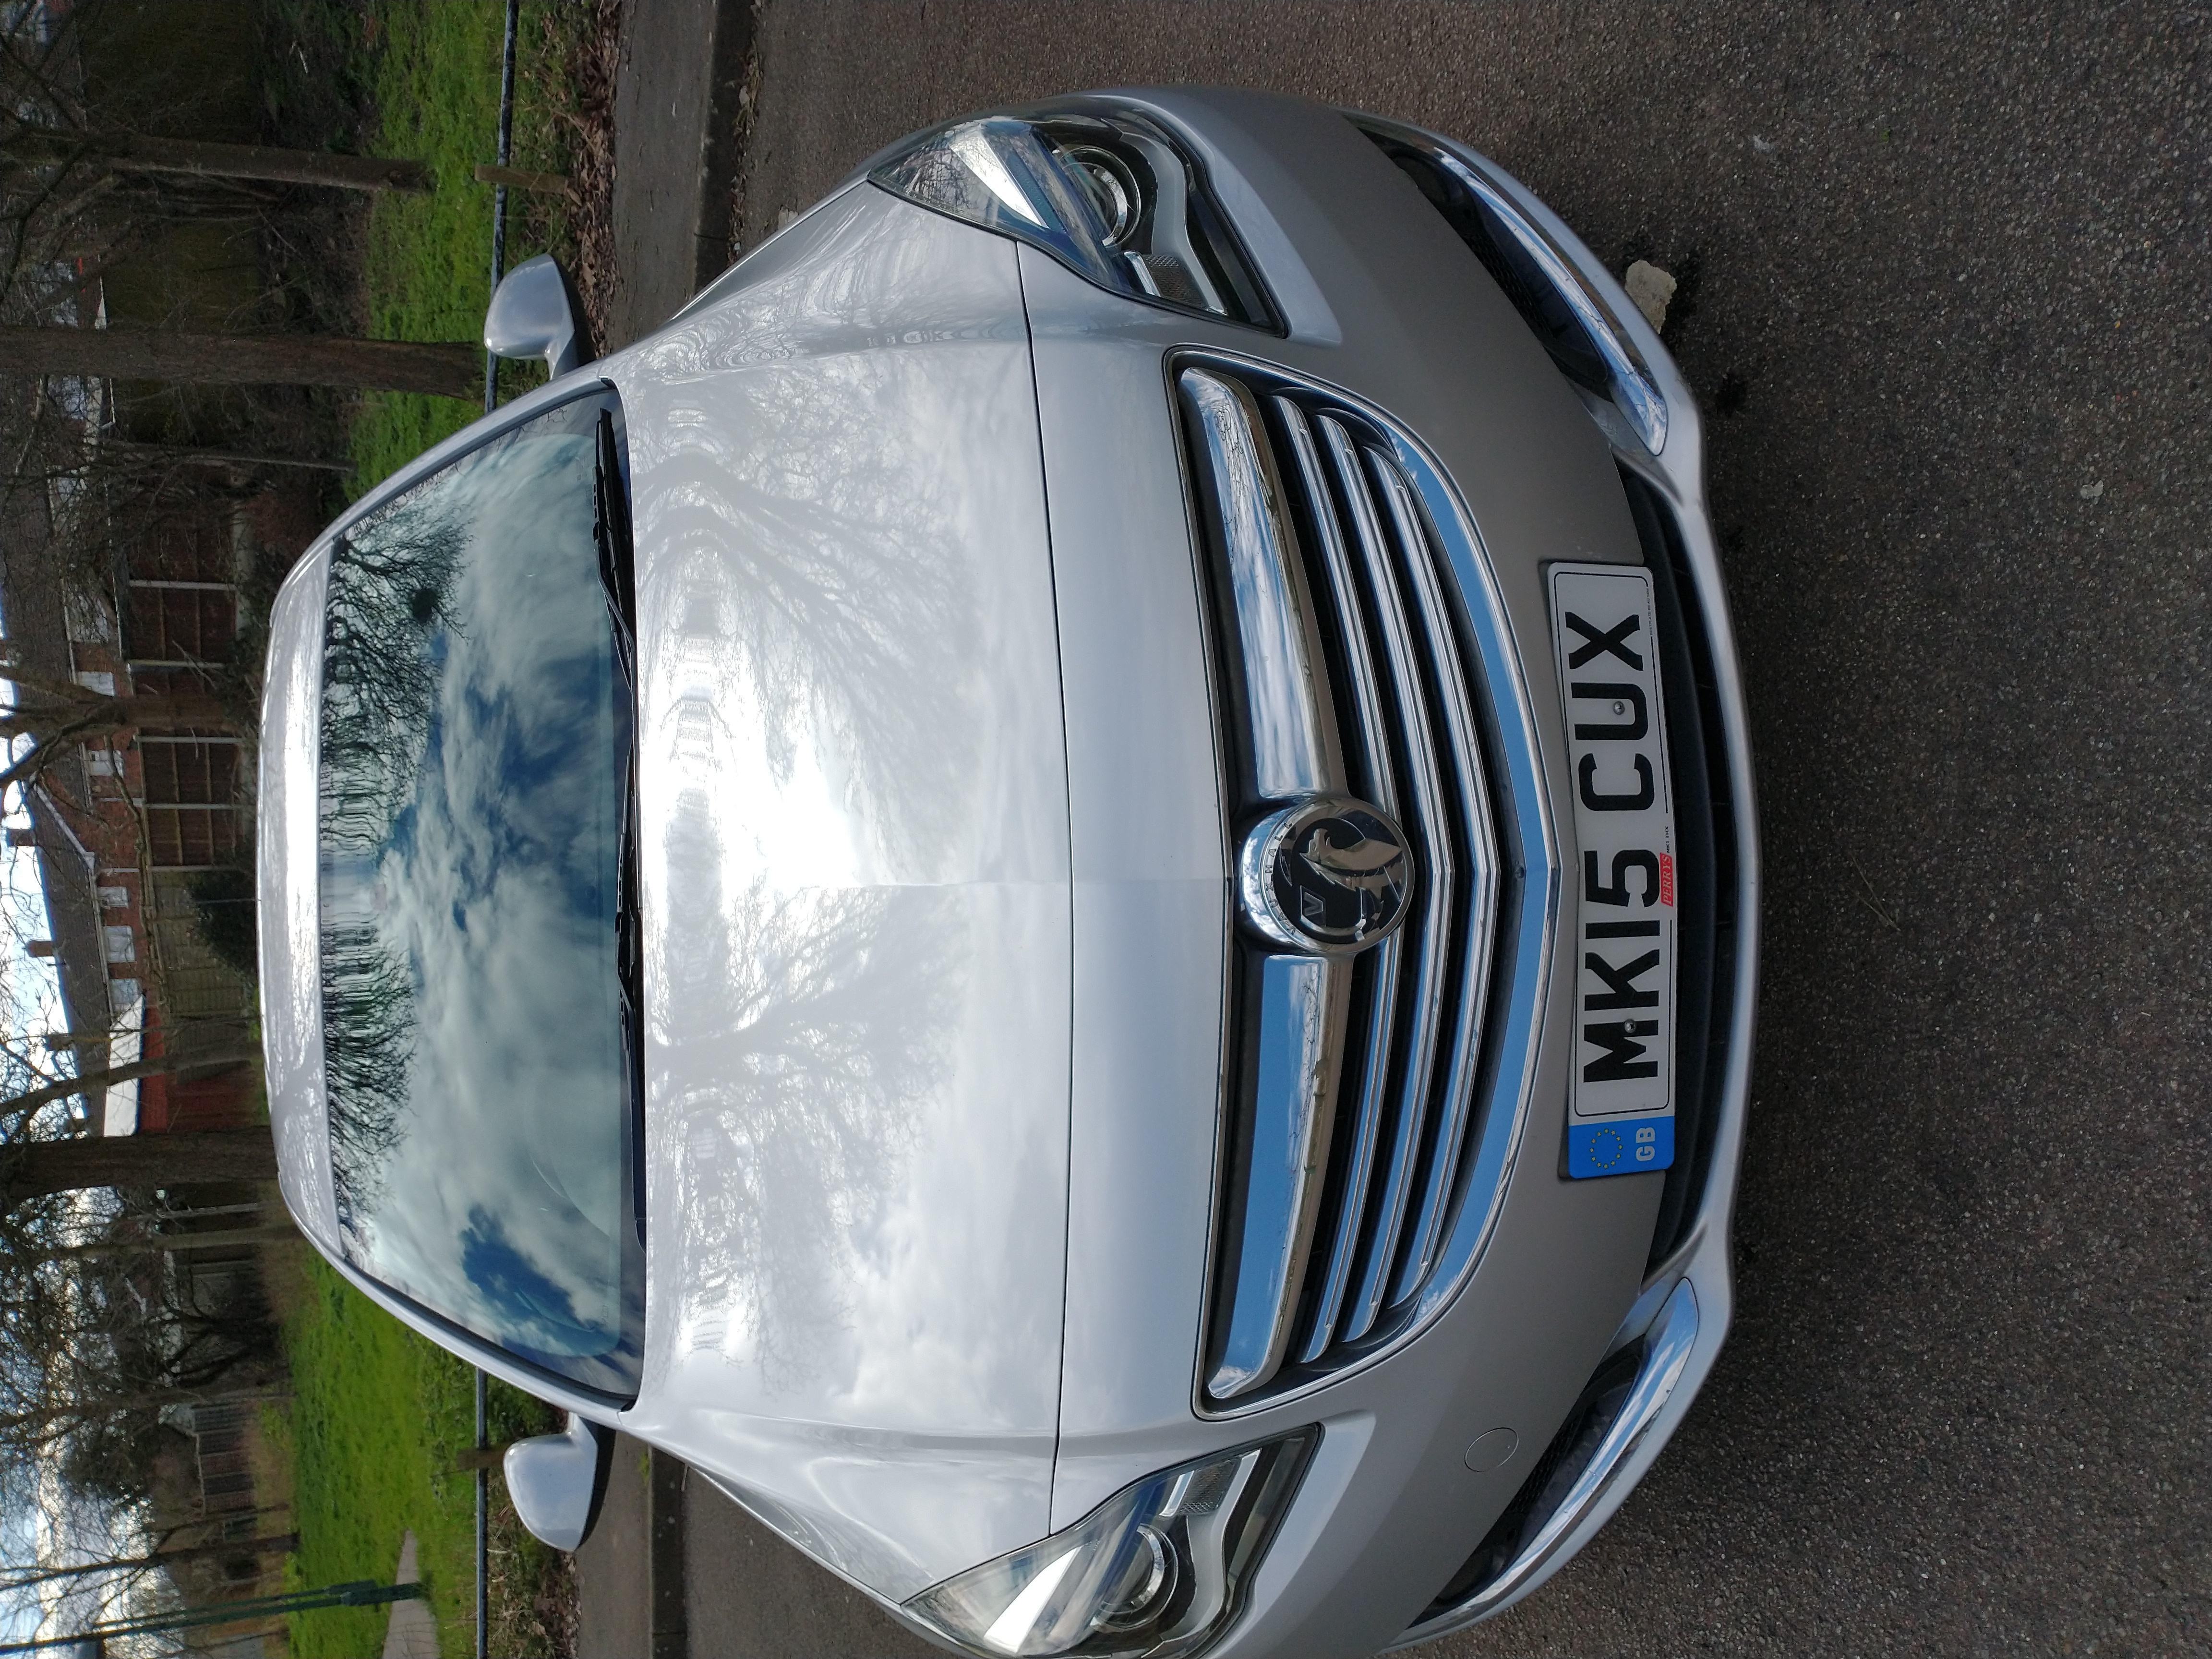 Vauxhall Insignia 2.0 CDTI 163 SRI 5dr Auto 15 plate.